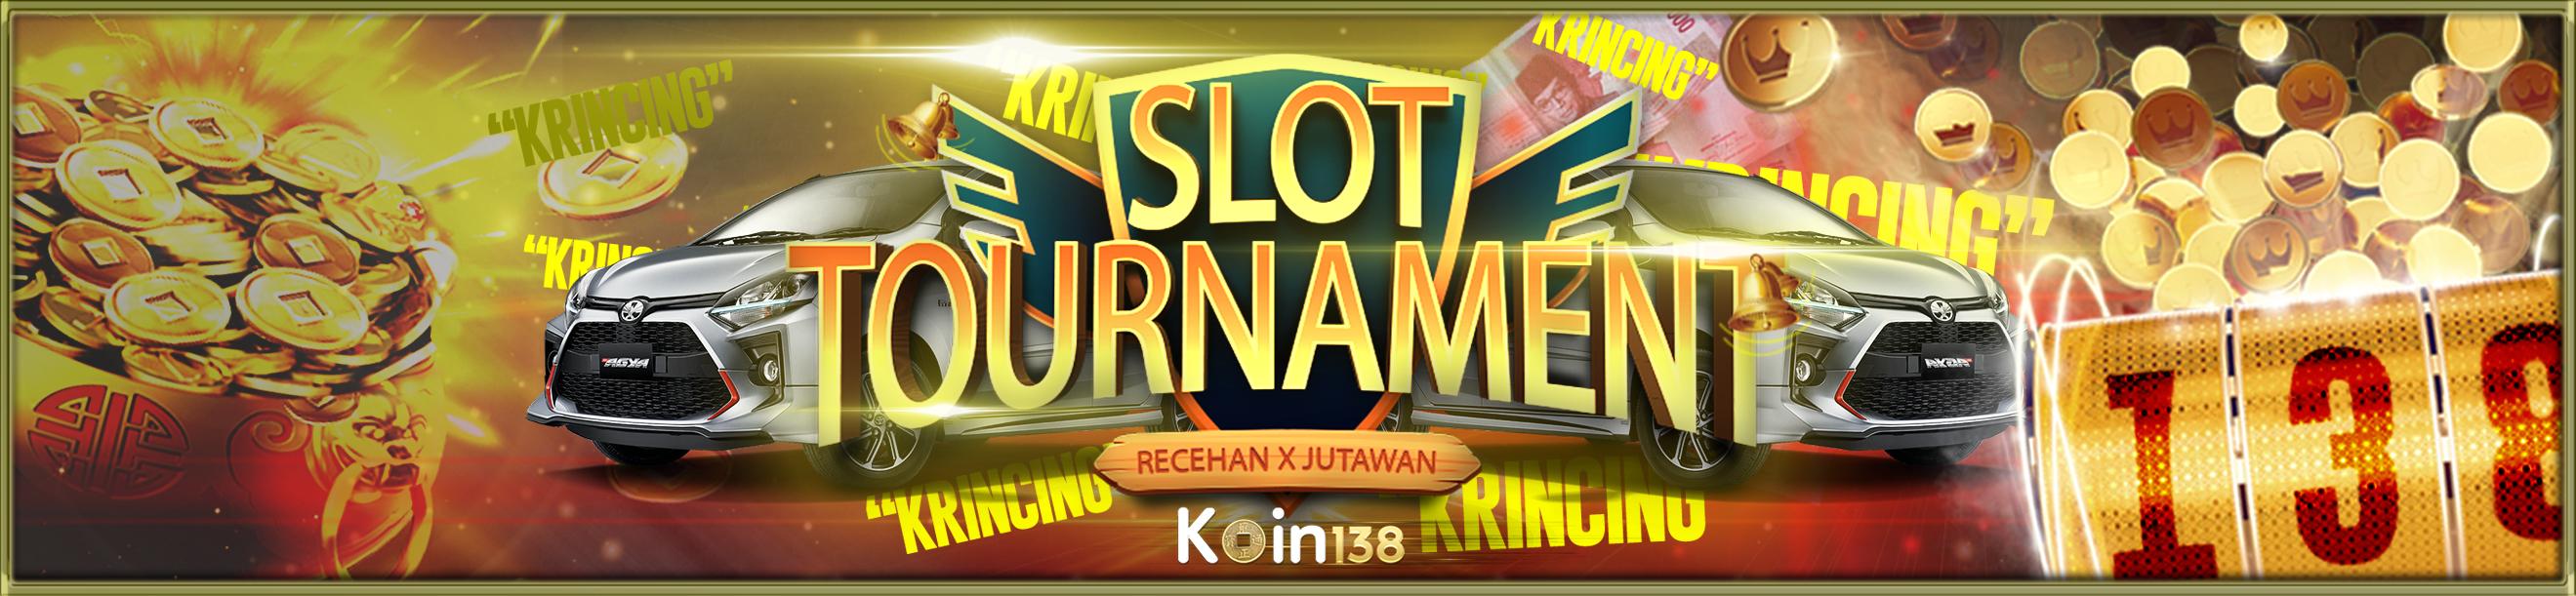 Turnamen Slot Receh